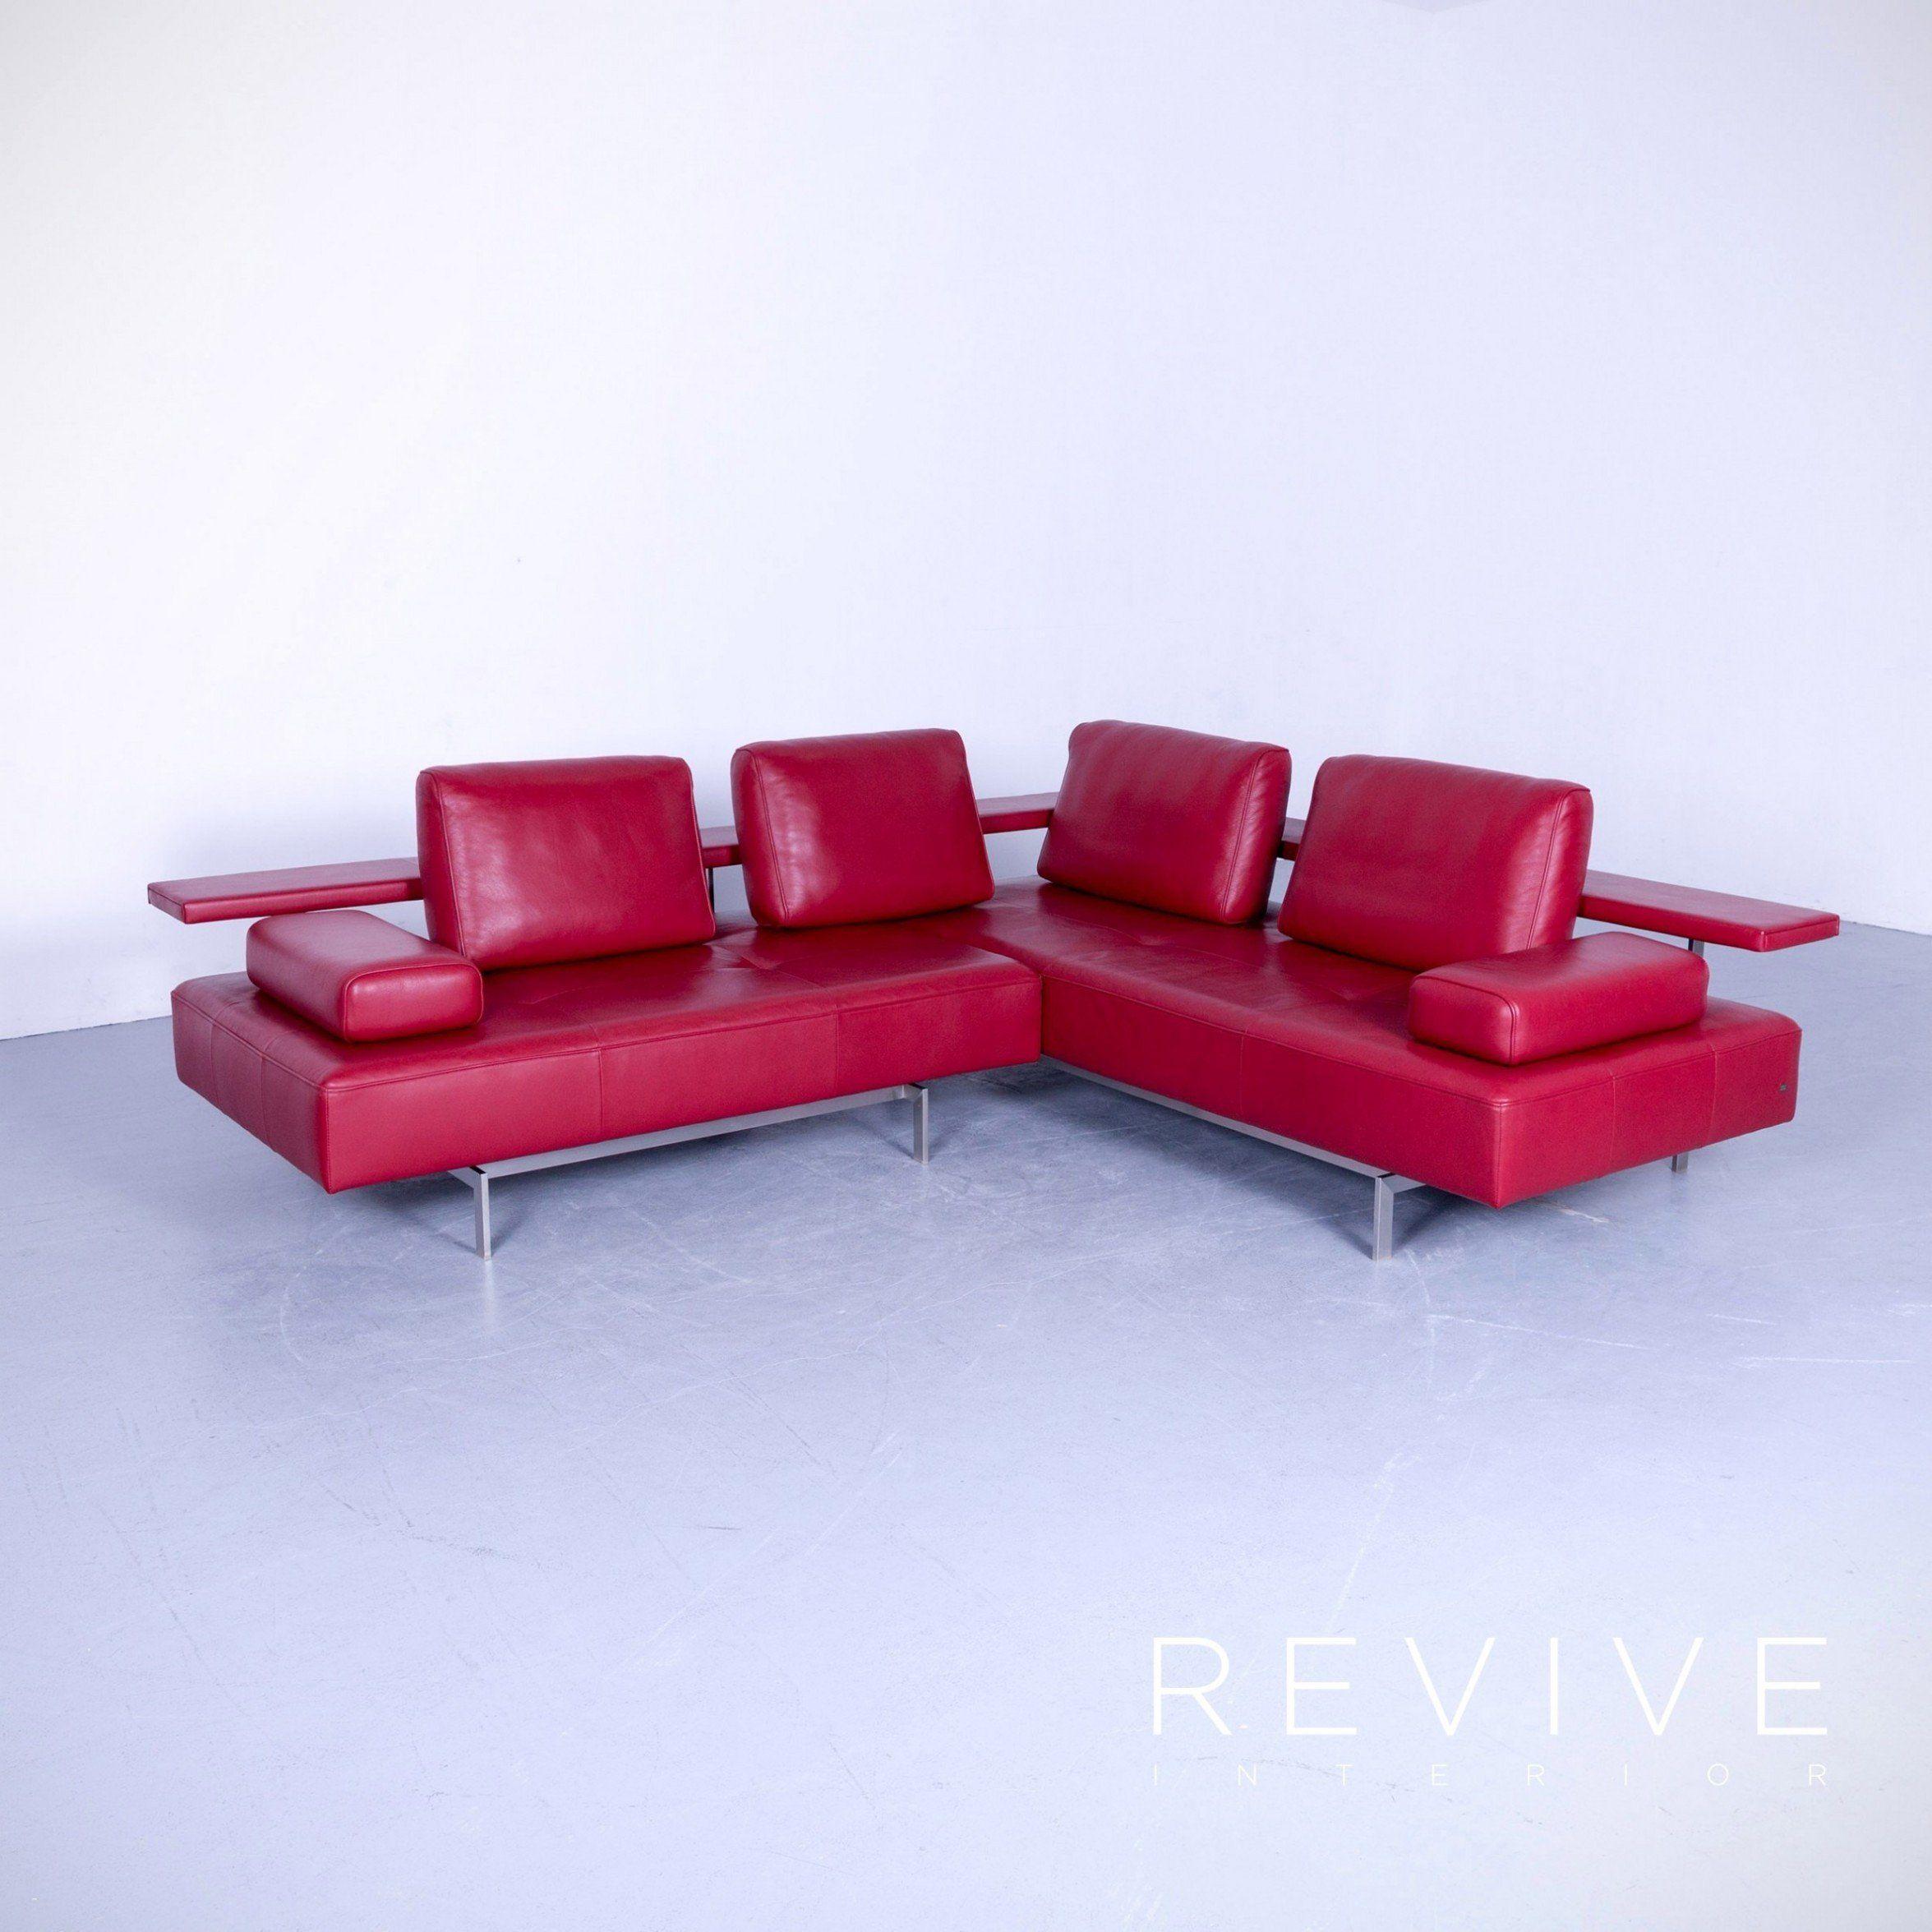 Red Living Room Ideas Elegant Sofa Red New Wohnlandschaft Design Leder Auch Schon Eck In 2020 Blue Sofa Living Living Room Red Sofa